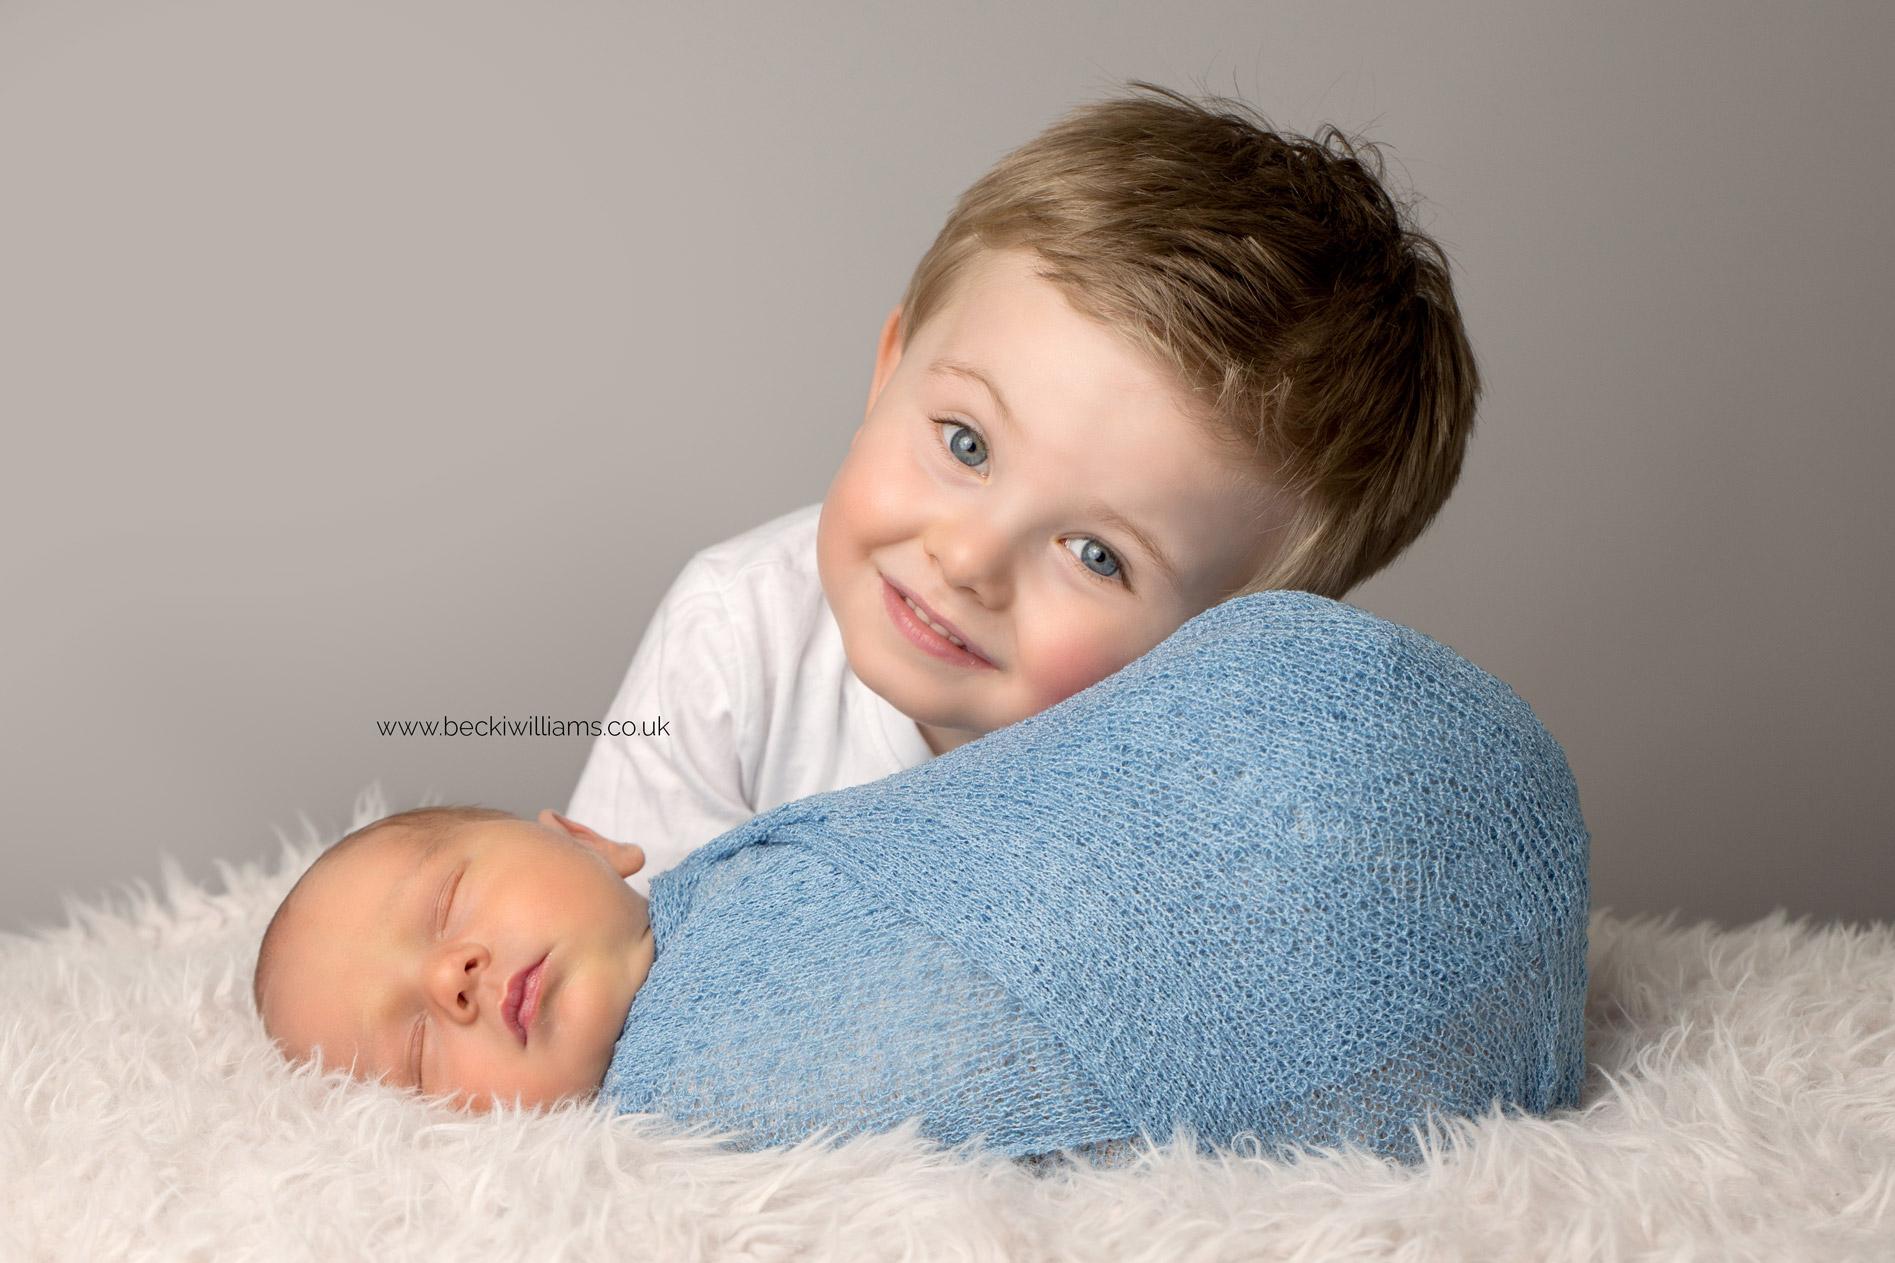 newborn-boy-portraits-hemel-hempstead-sibling-big-brother-blue-boy.jpg